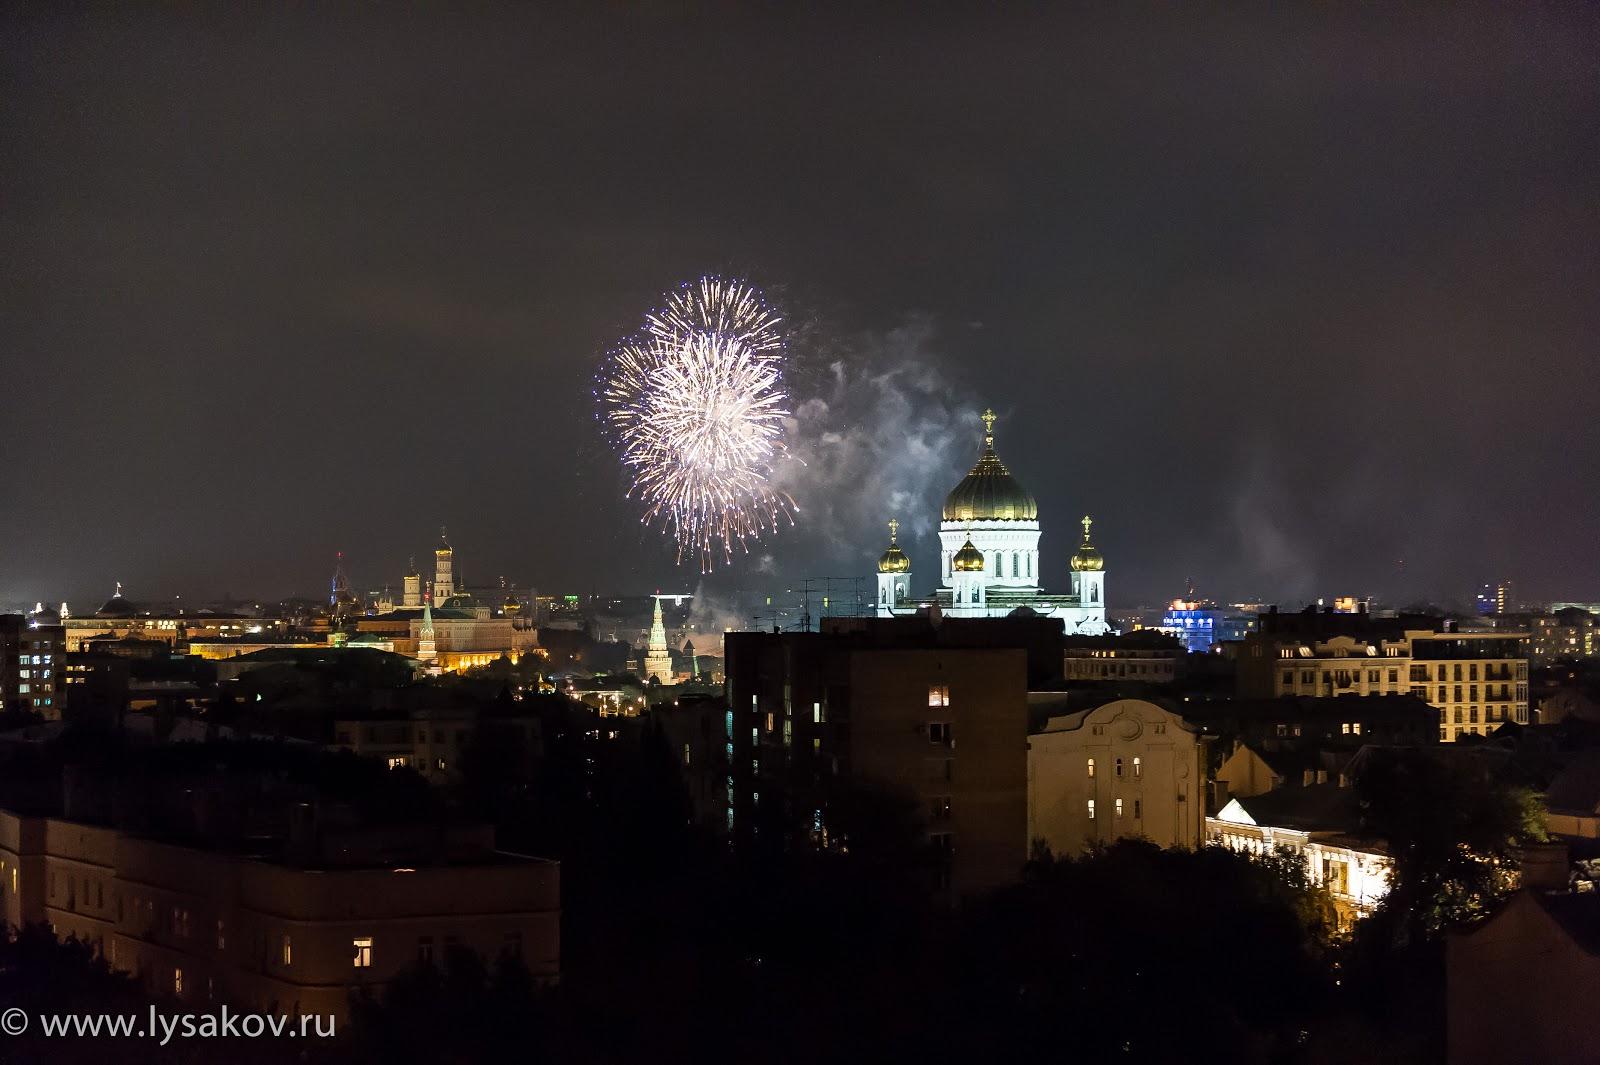 Салют над Кремлем и Храмом Христа Спасителя